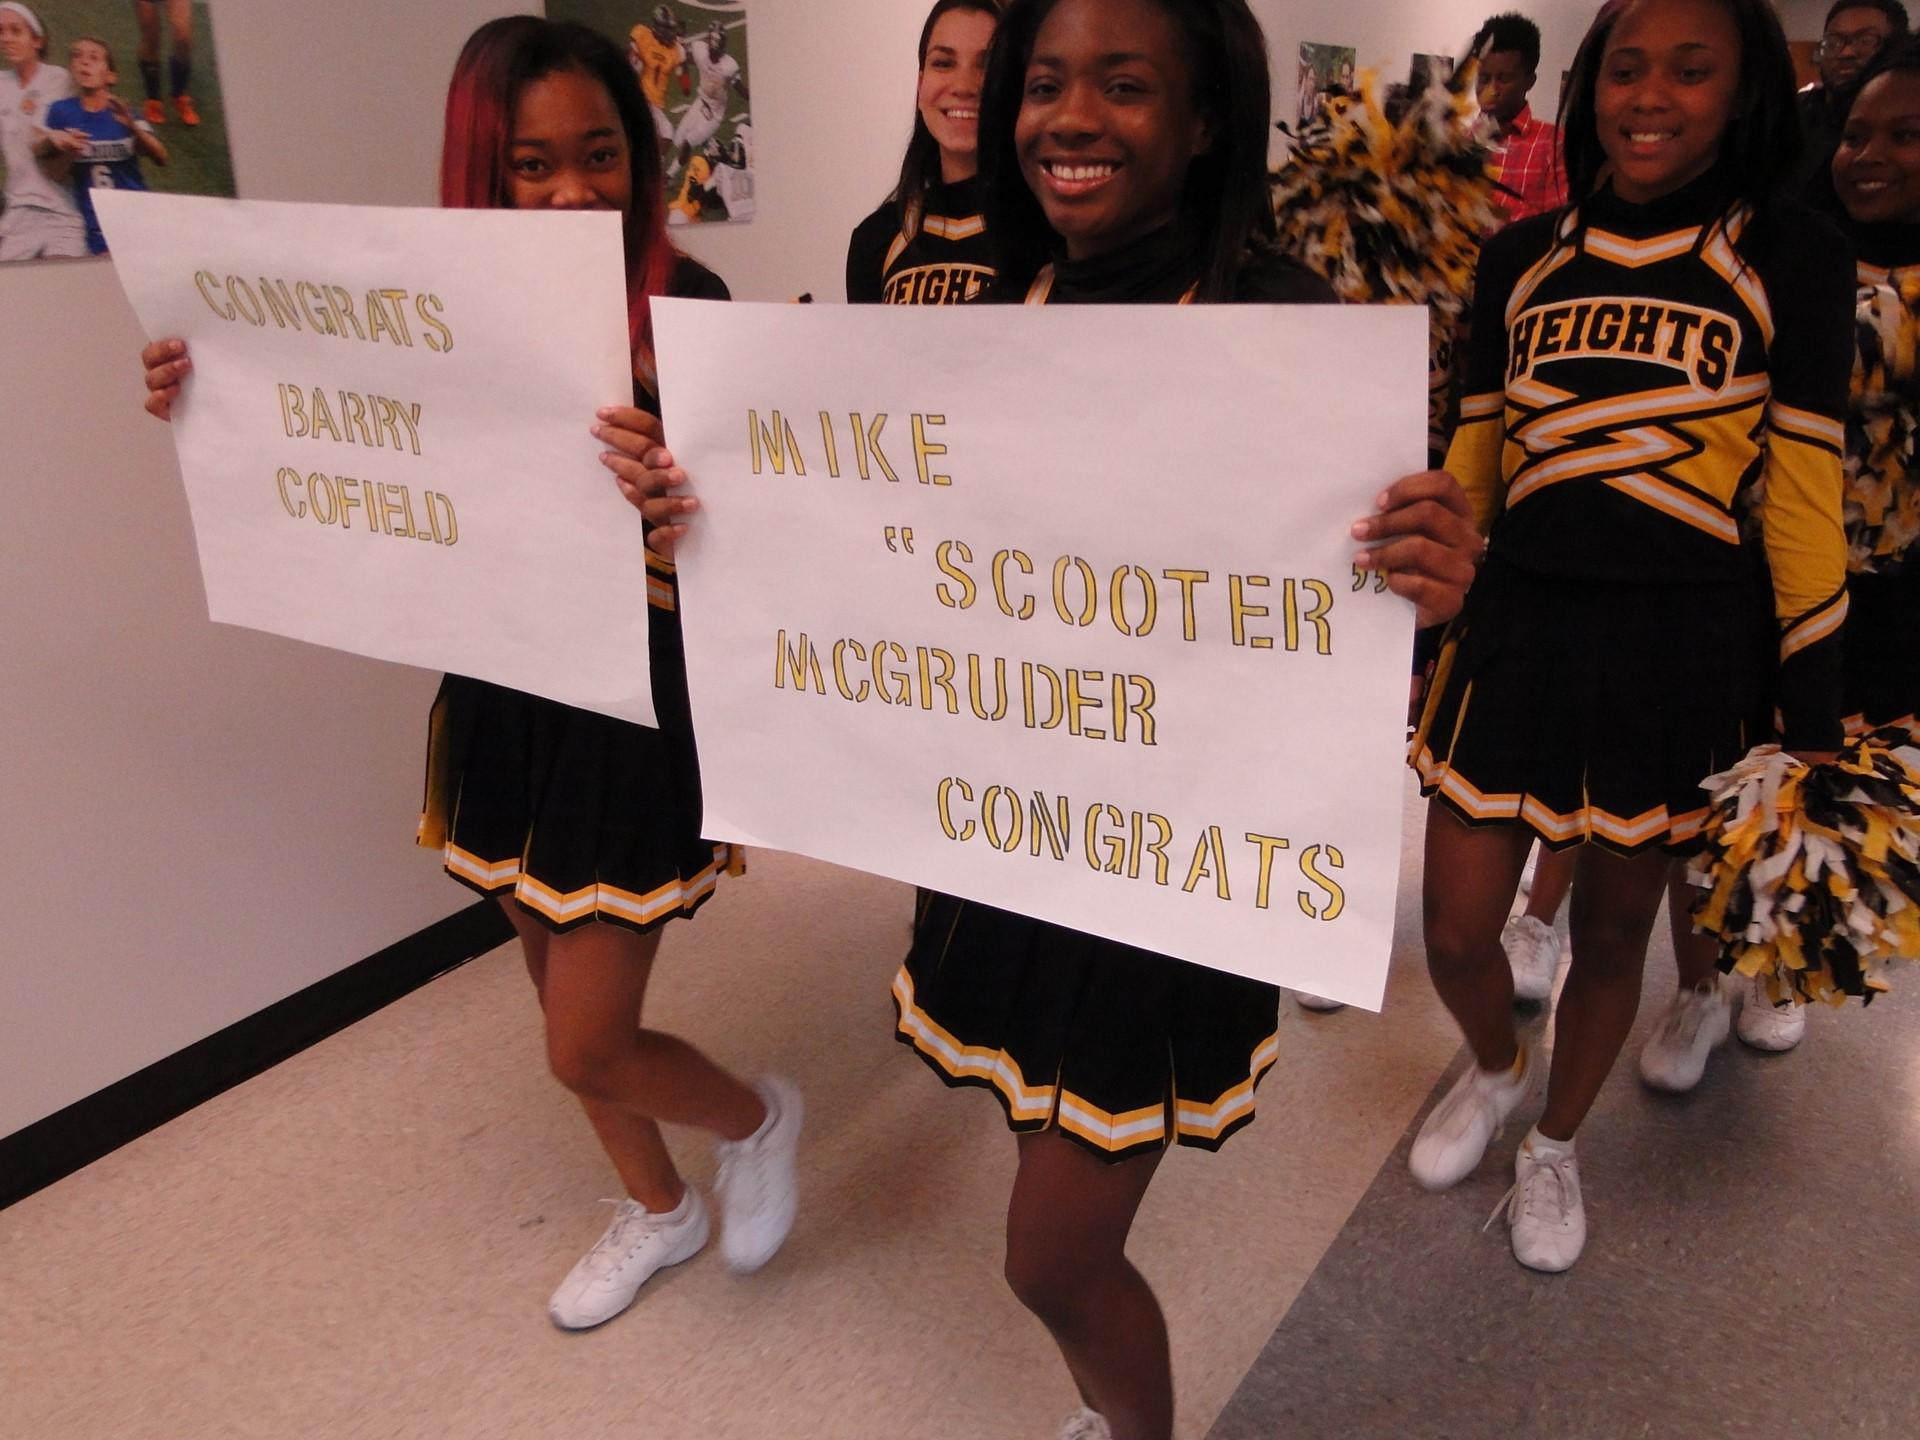 Cheerleaders lead the parade